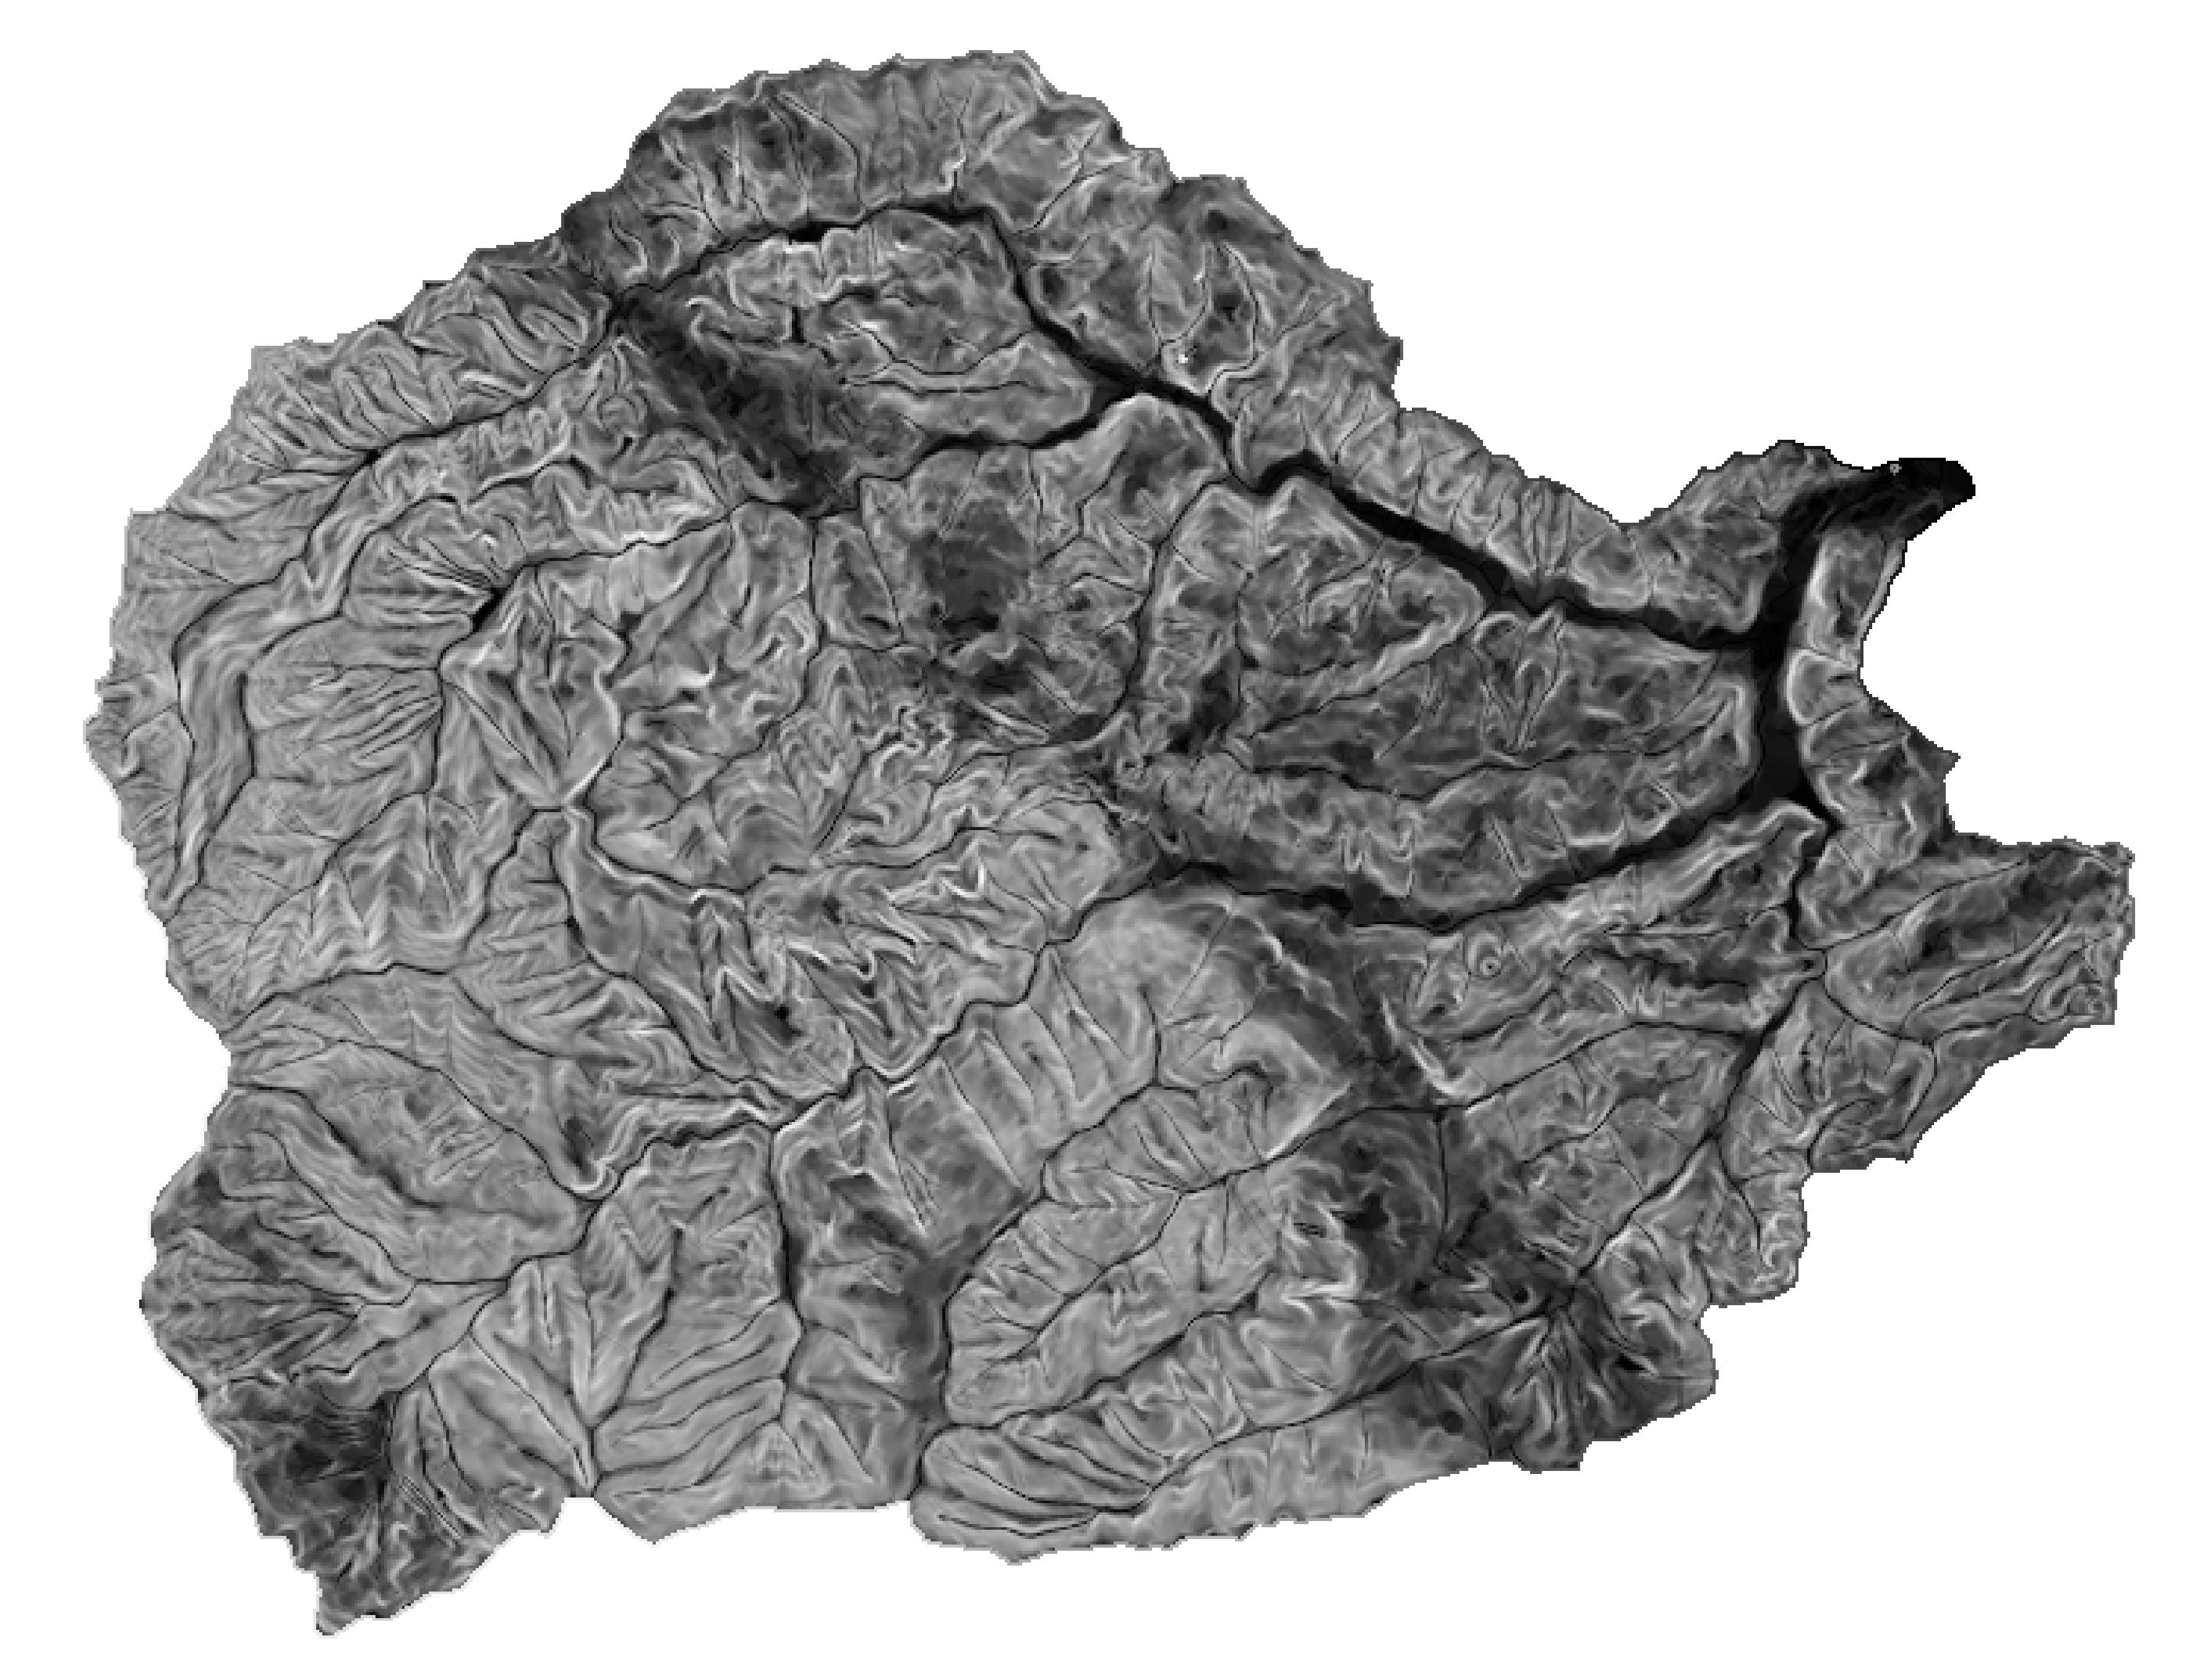 carta-pendenze-pogliaschina-analisi-morfometriche